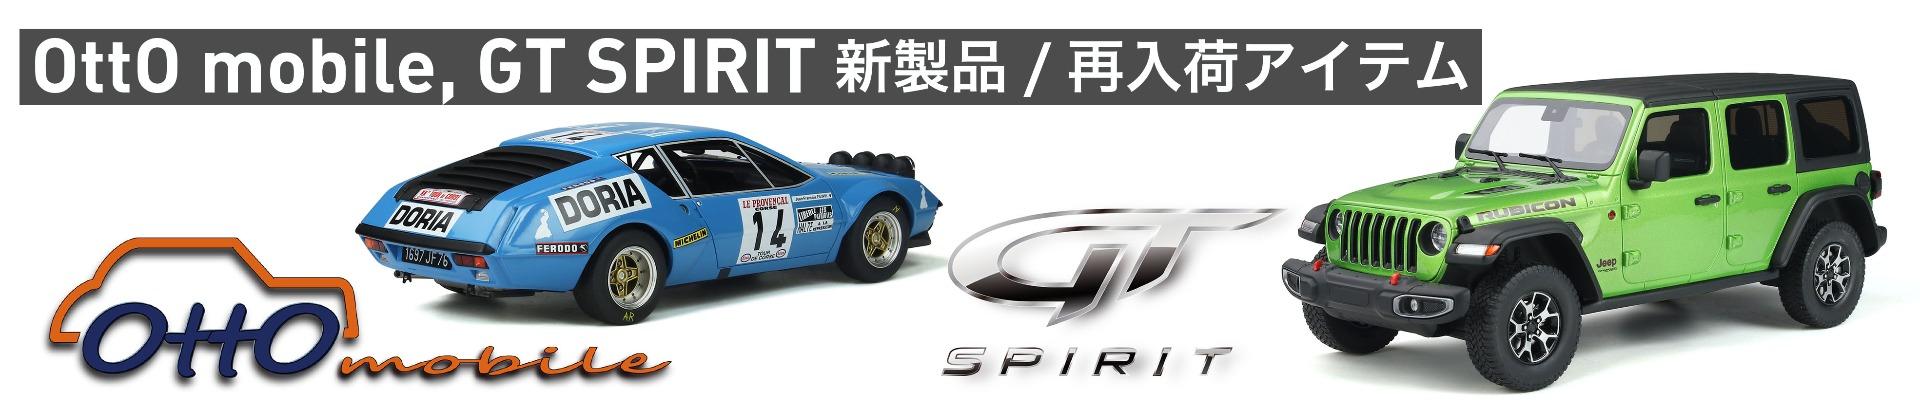 GT SPIRITミニカー